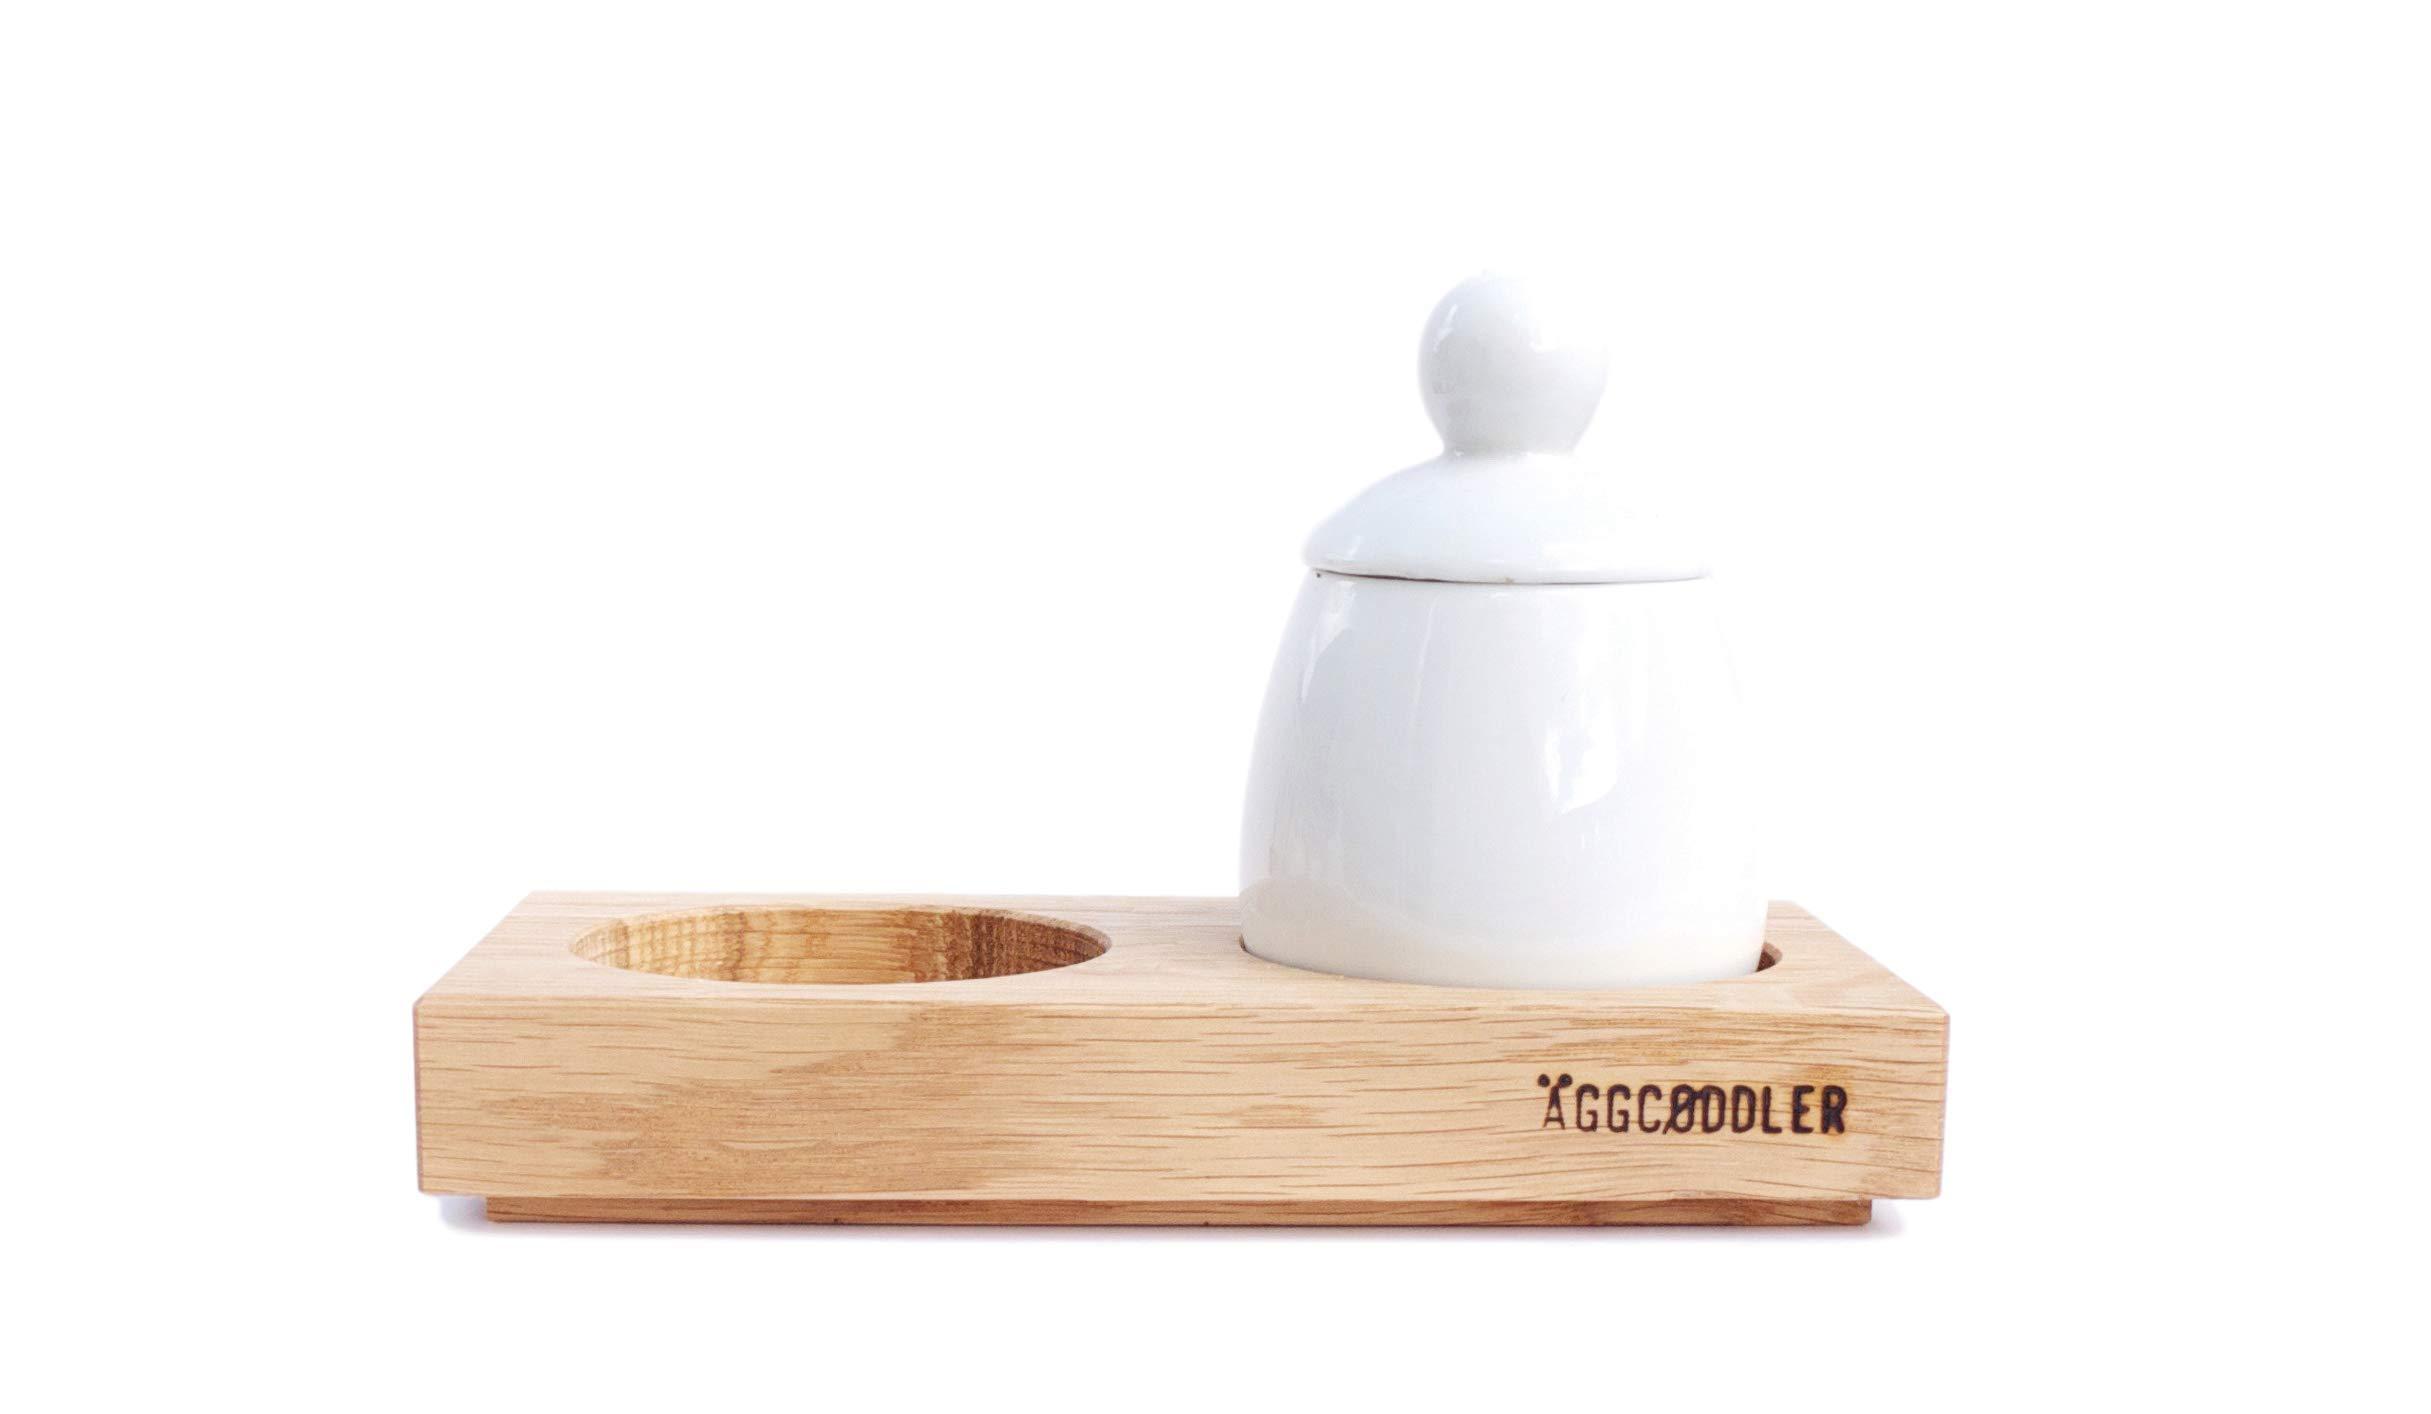 AggCoddler - Bamboo Display Tray (XL - Holds 2)